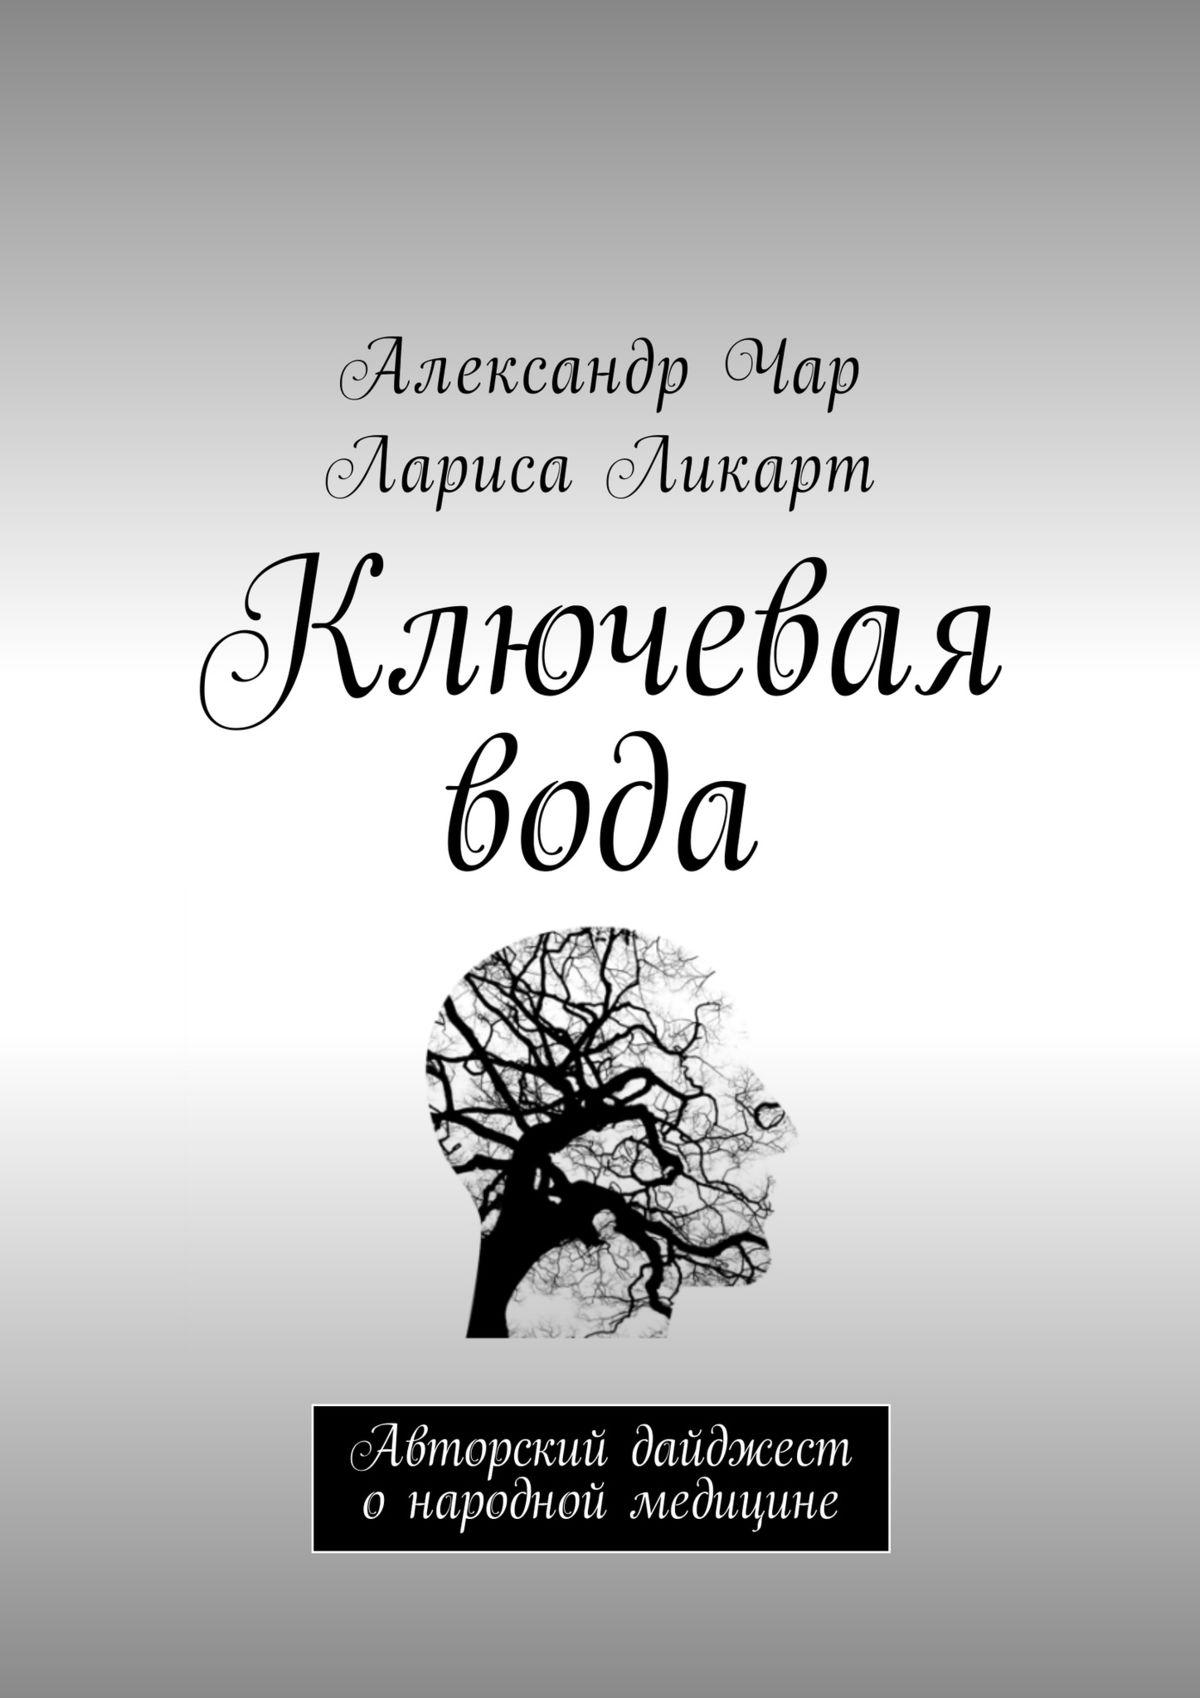 Александр Чар Ключевая вода. Авторский дайджест о народной медицине